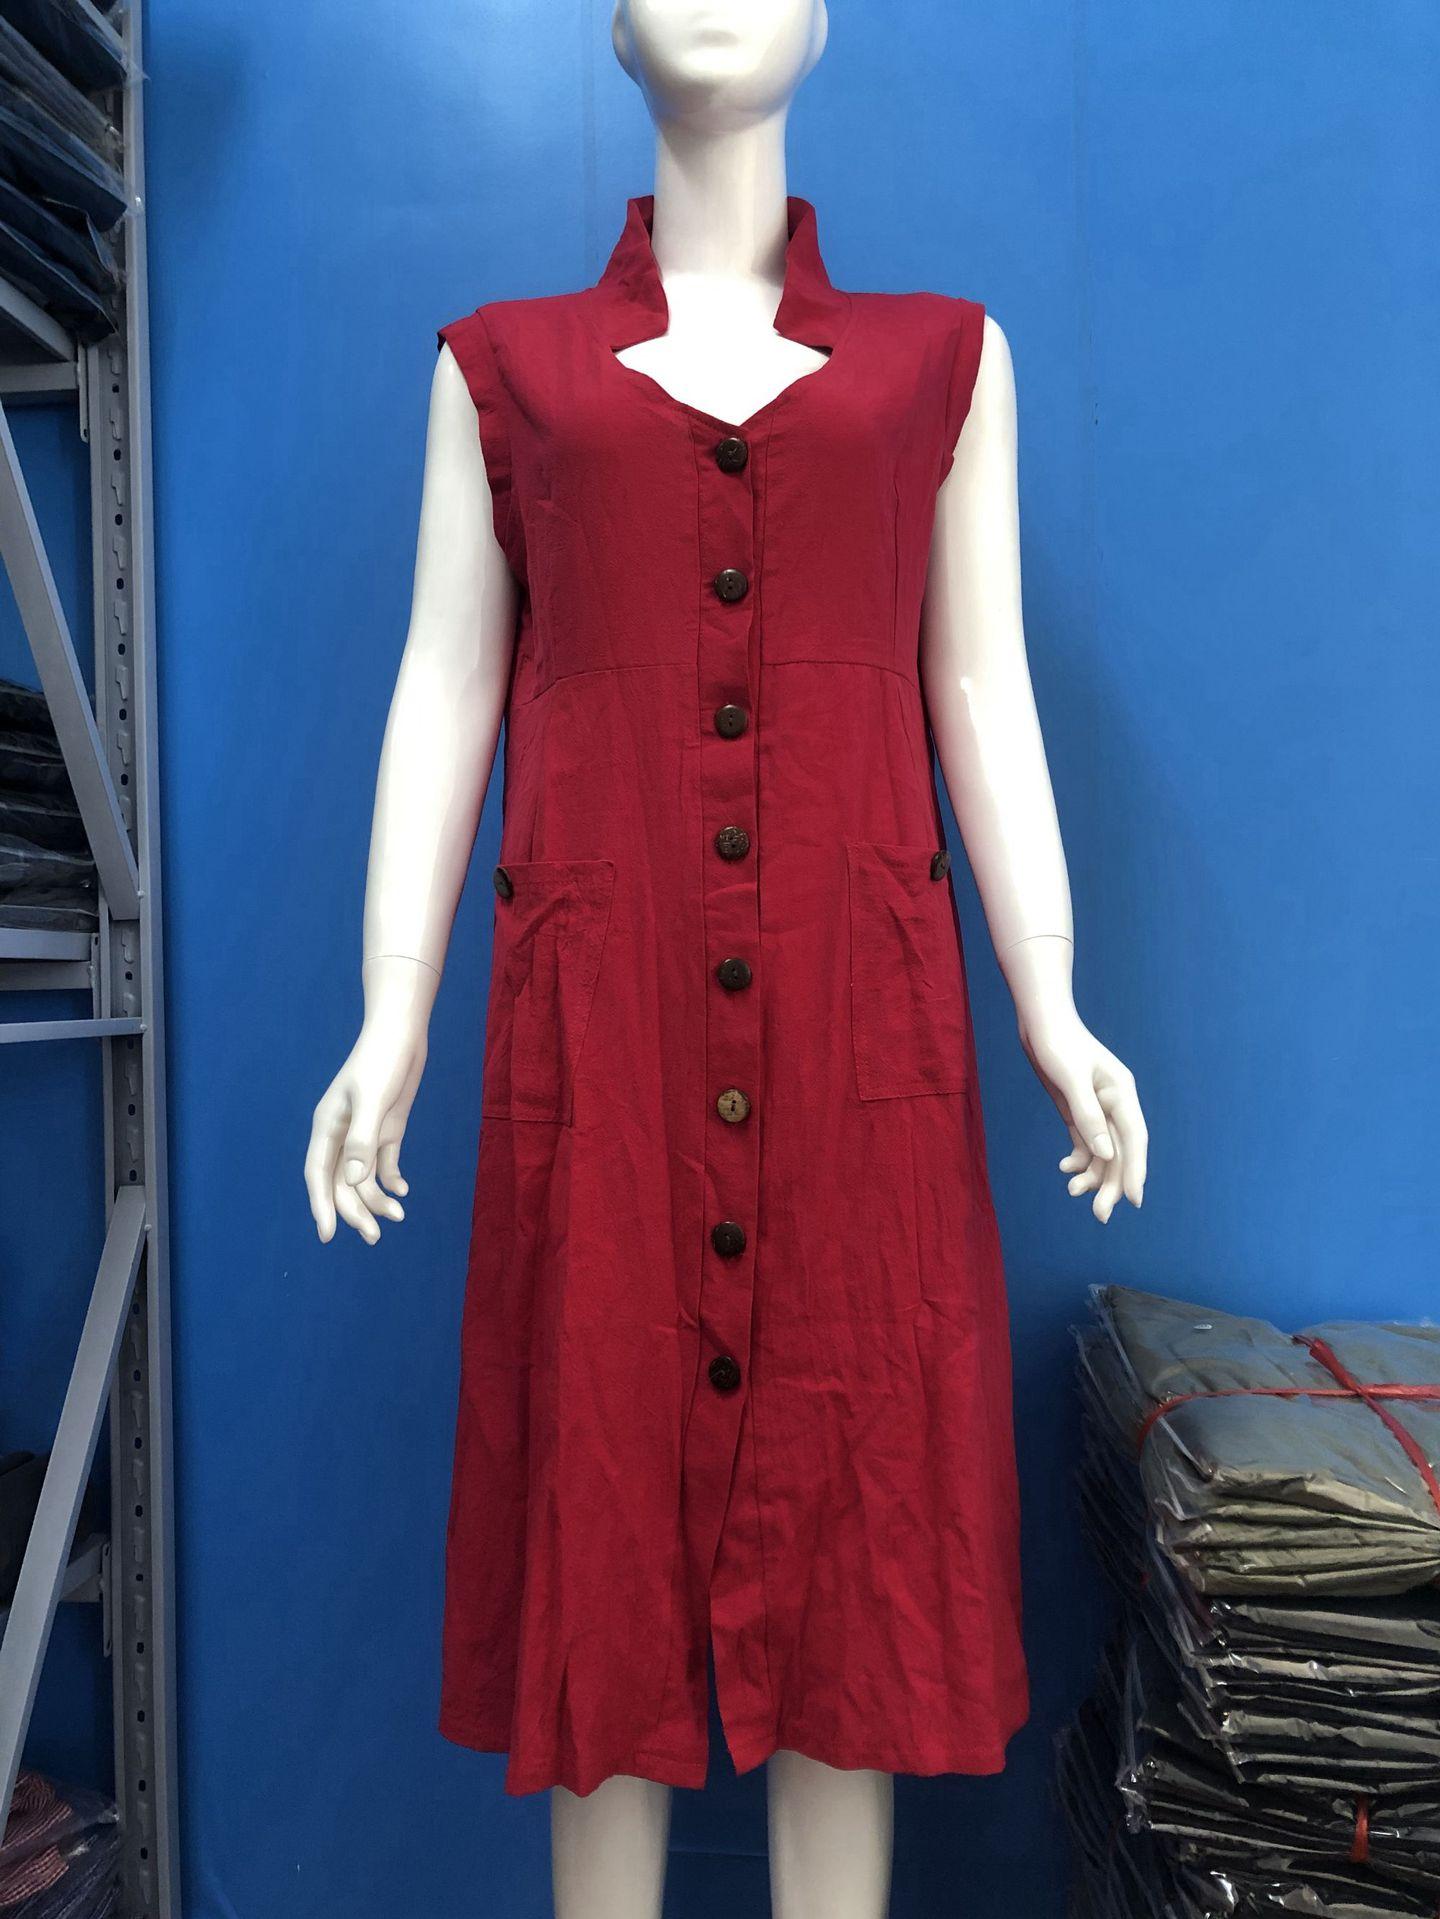 Plus Size Women's Summer Sundress  2021 Fashion Solid Shirt Dress Sleeveless Lapel Button Midi Vestidos Female Button Robe